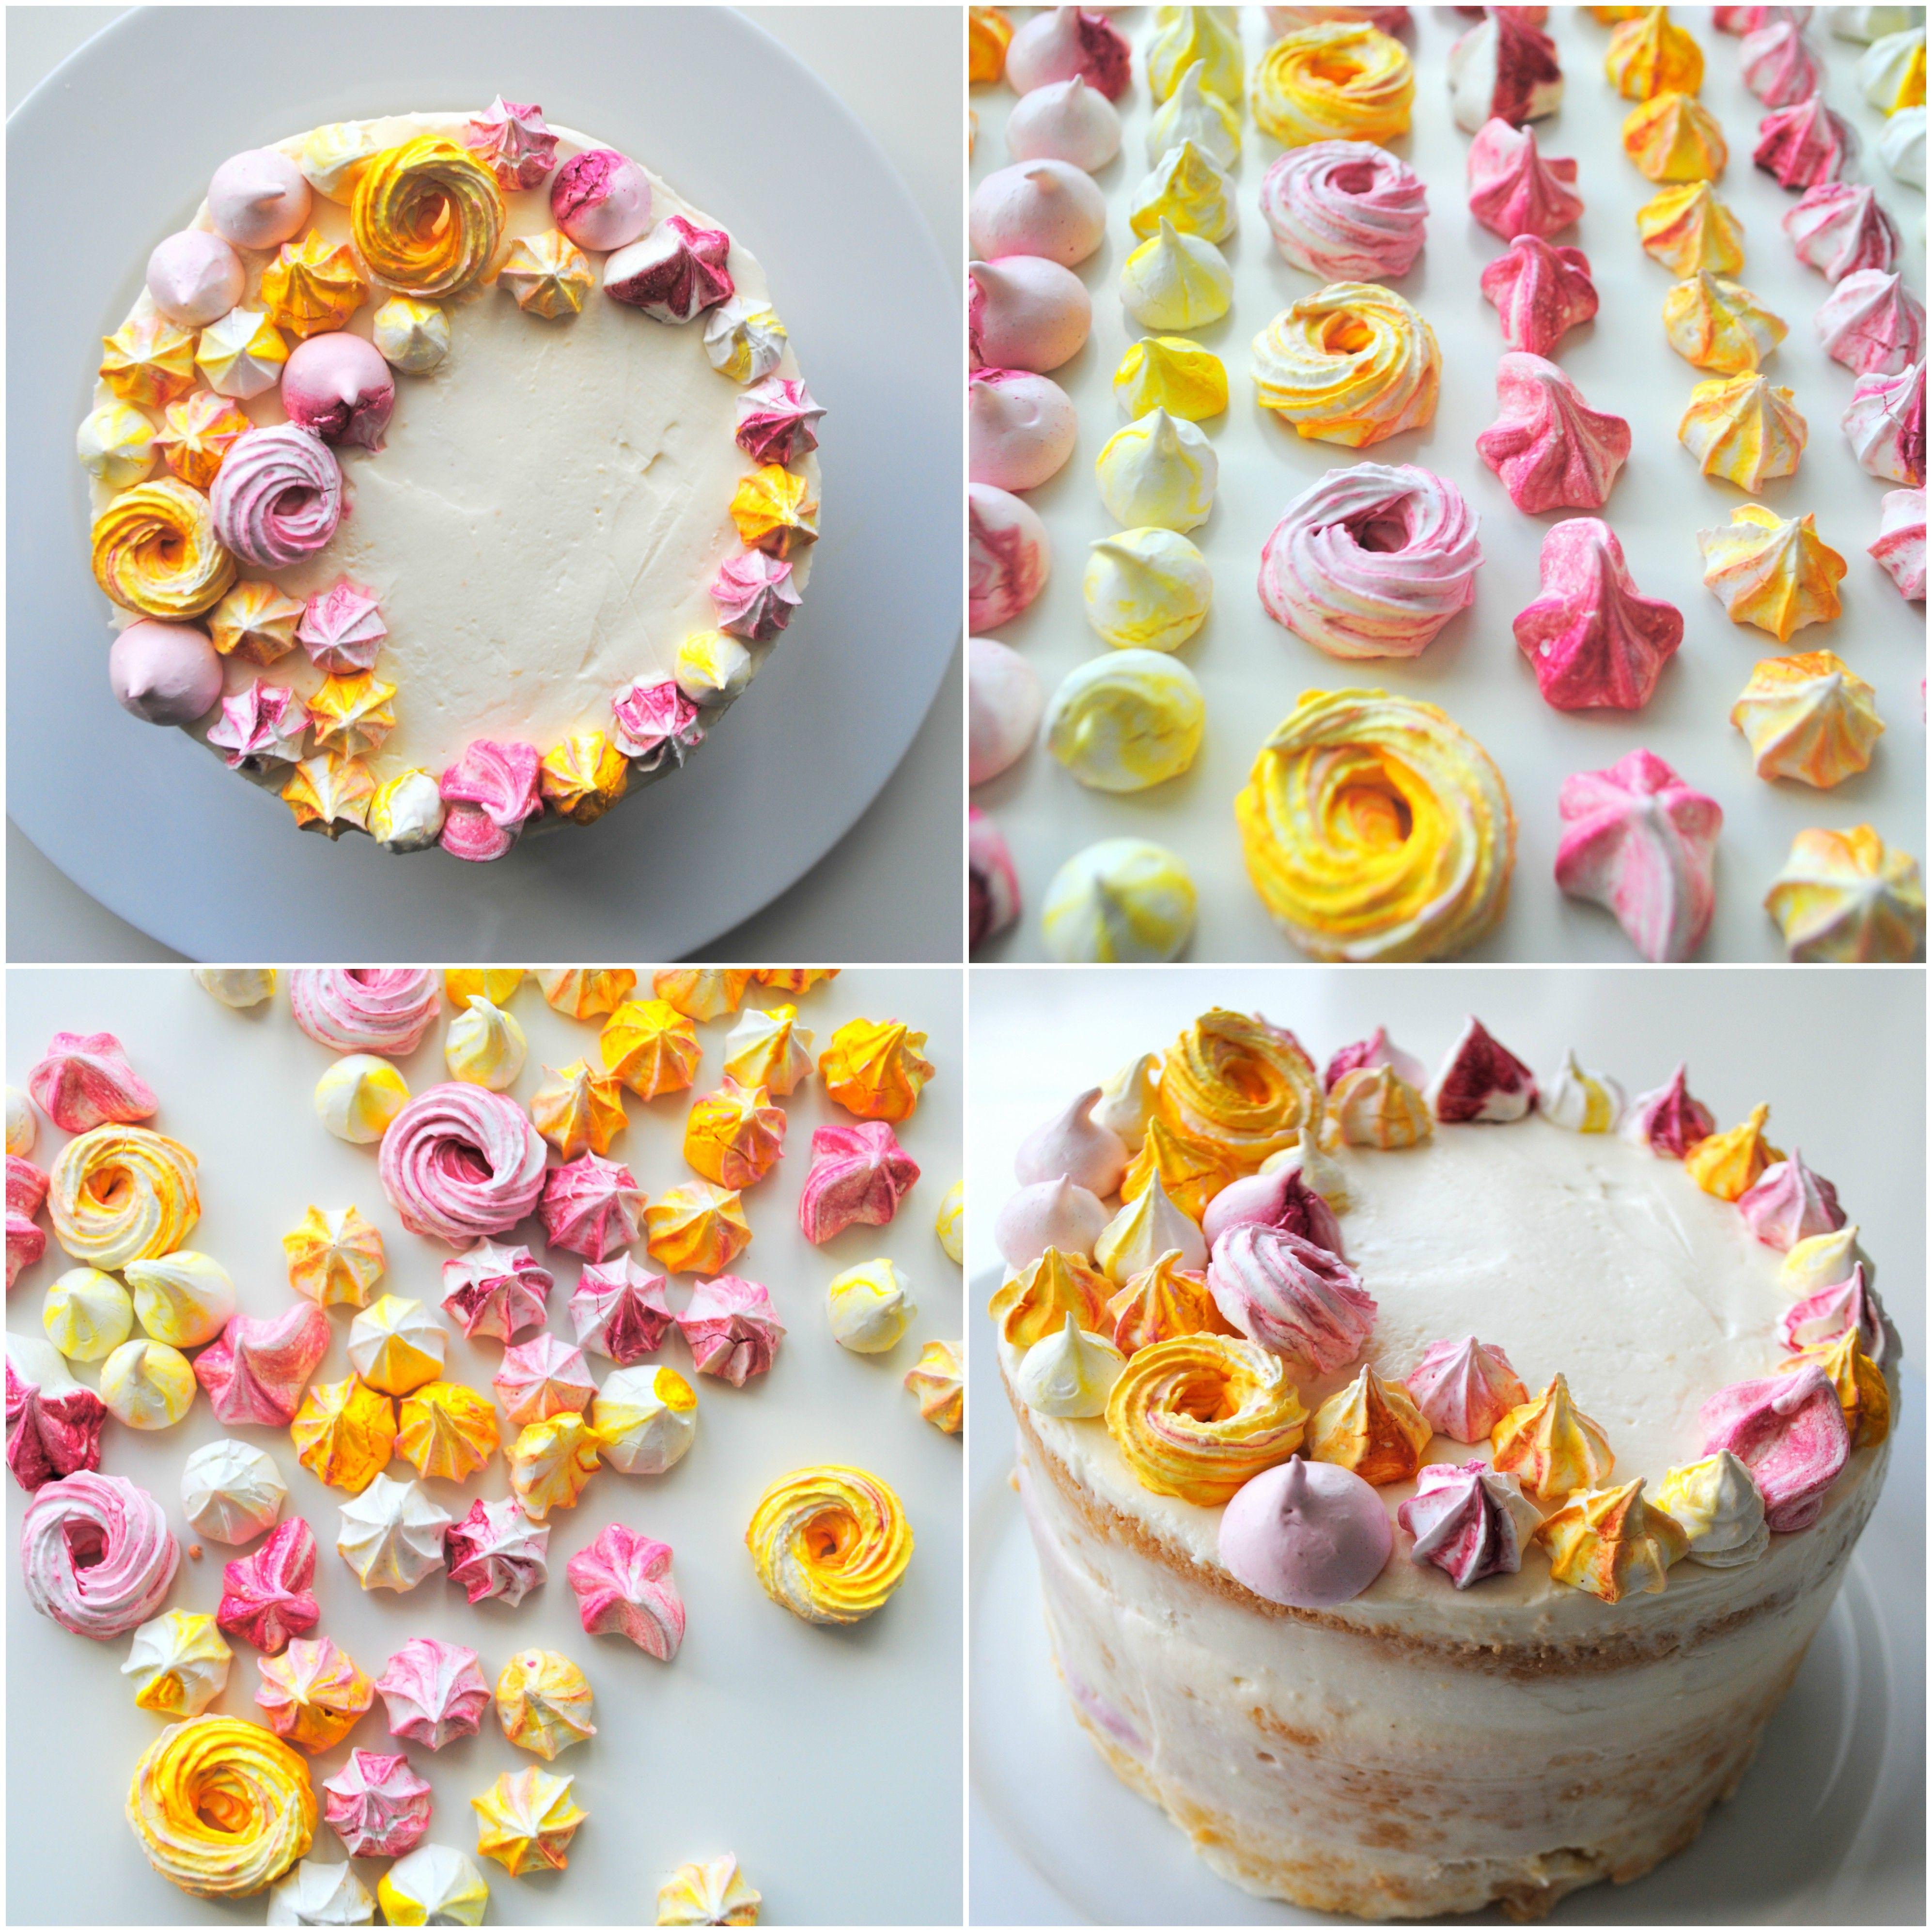 make variations of meringue kisses for cake decoration instead of